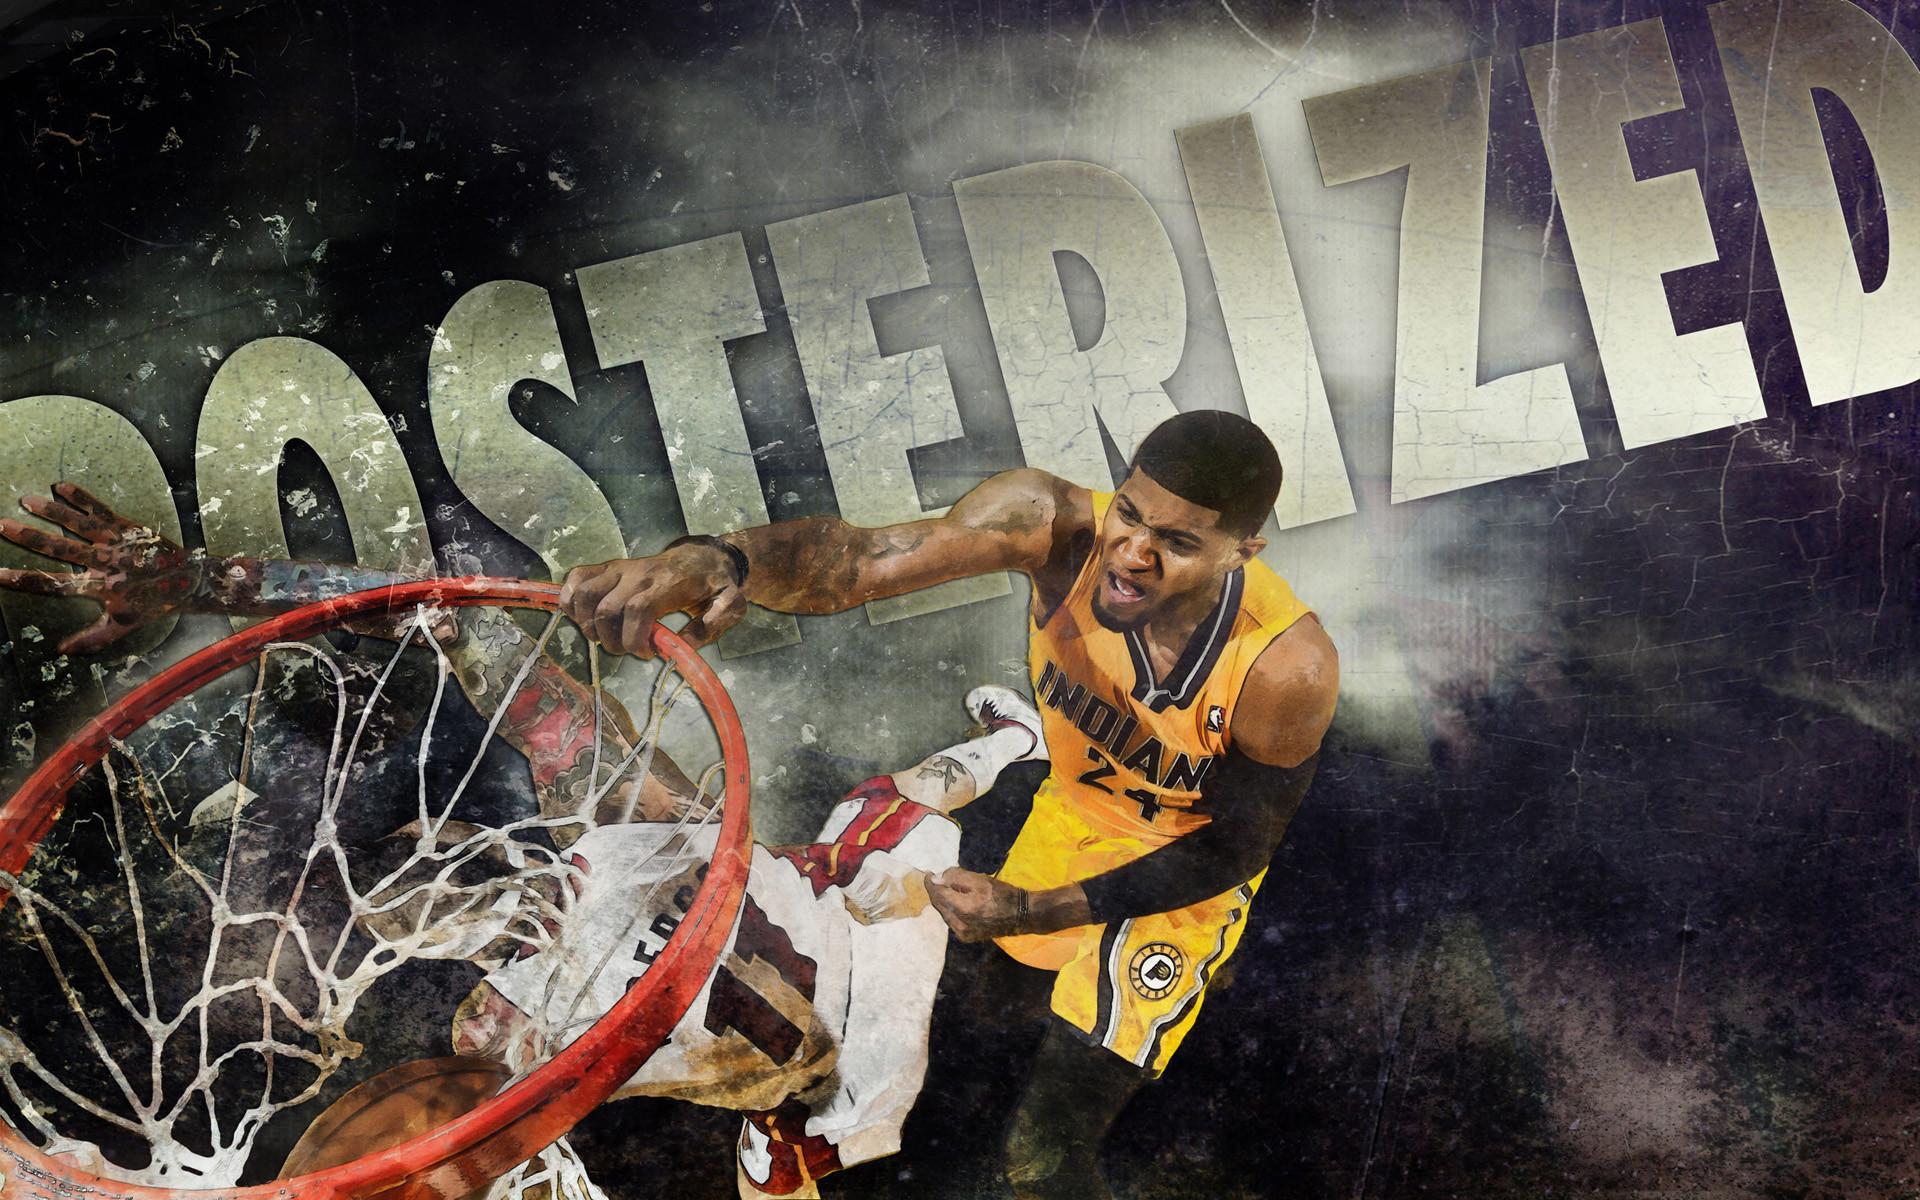 Paul George Indiana Pacers NBA Wallpaper HD.